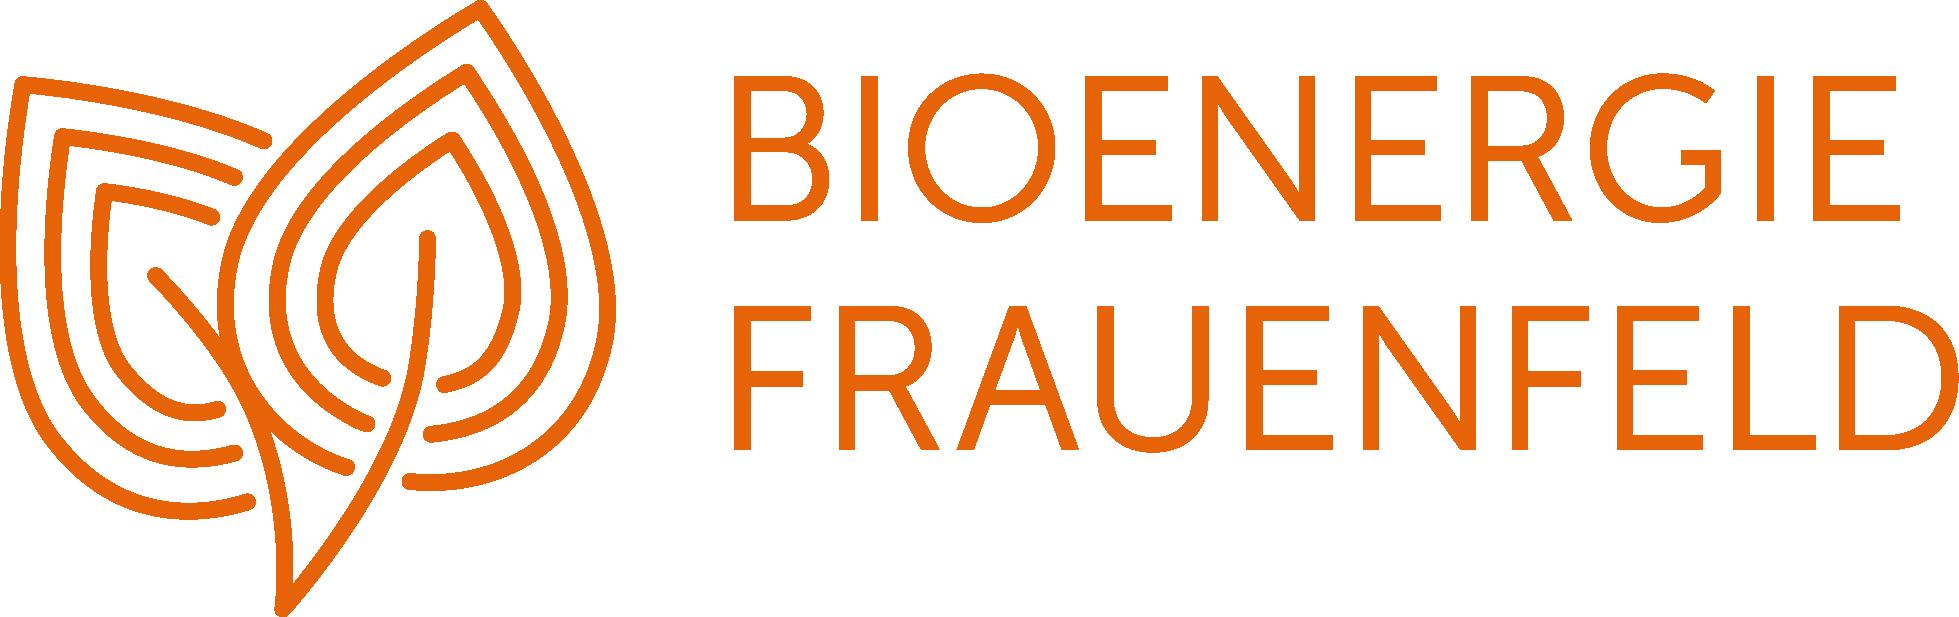 Bioenergie Frauenfeld Logo